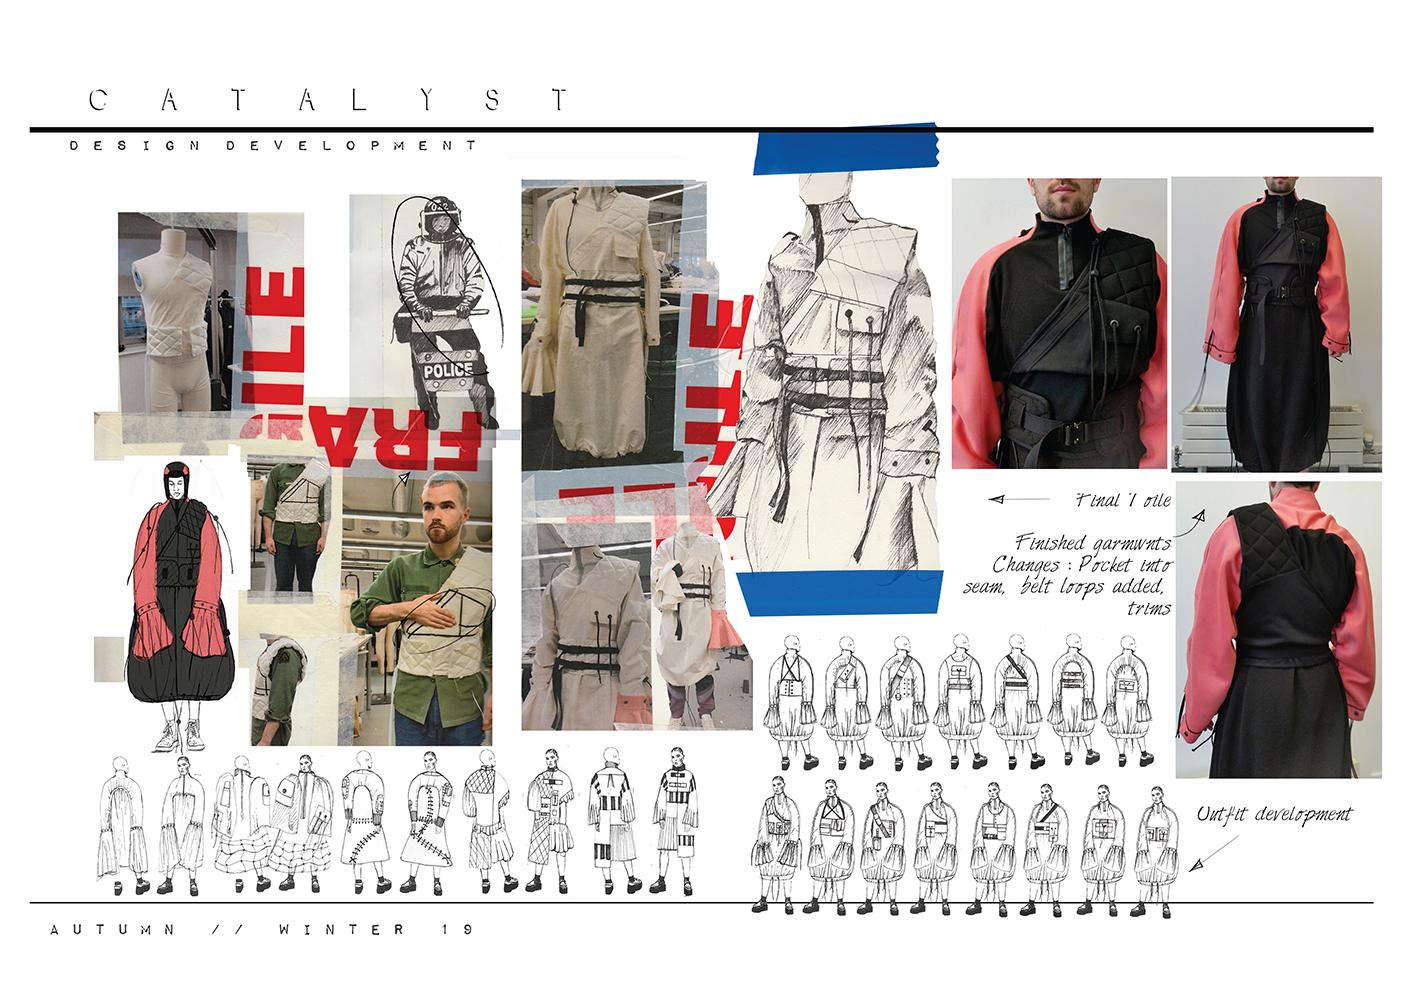 RMC_0007_online_Part8.pdf.jpg